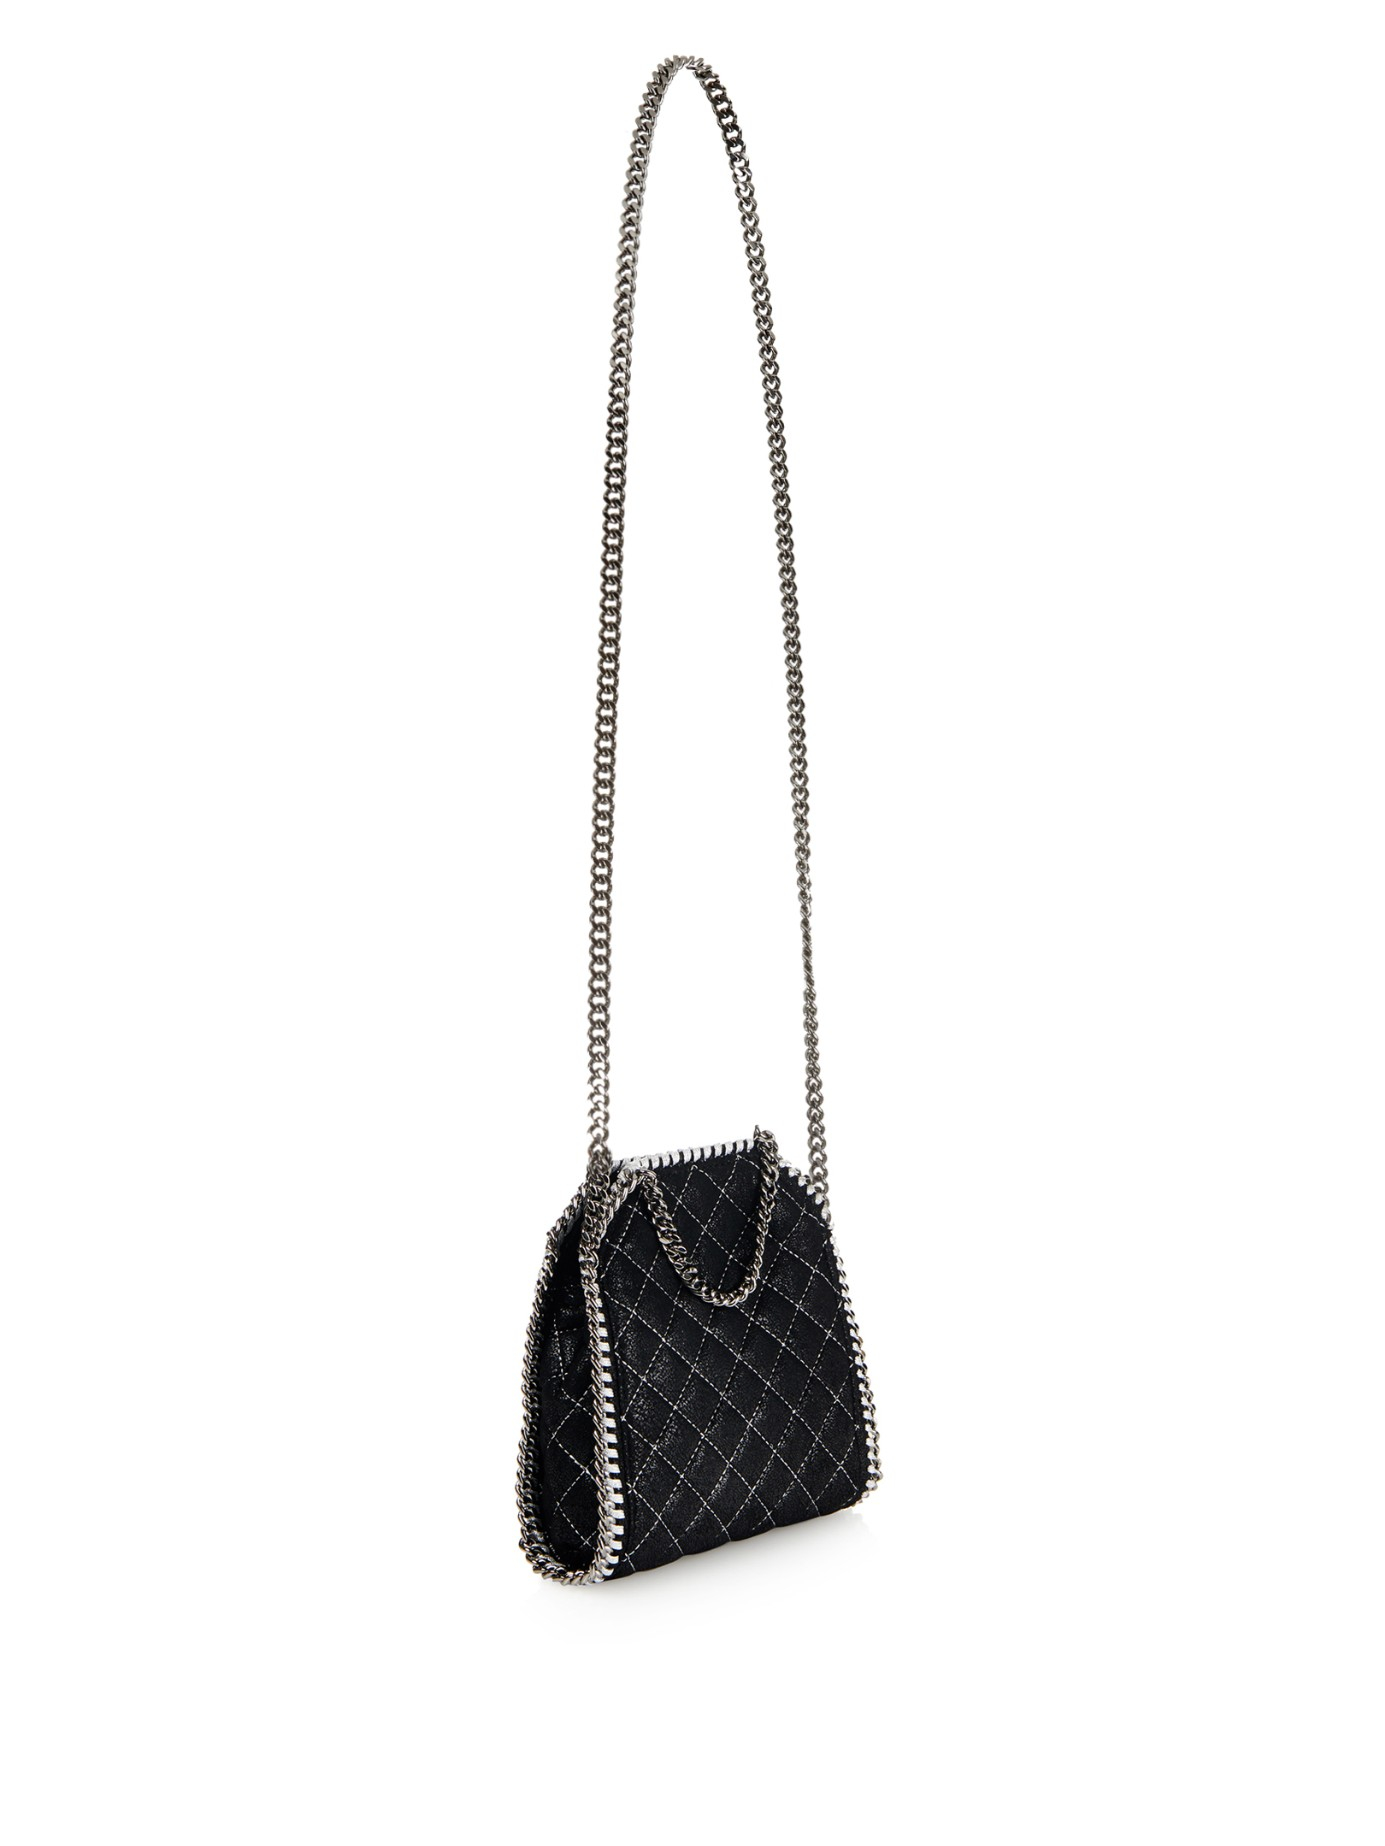 Lyst - Stella McCartney Falabella Tiny Quilted Cross-body Bag in Black 7f1b19826cf4a